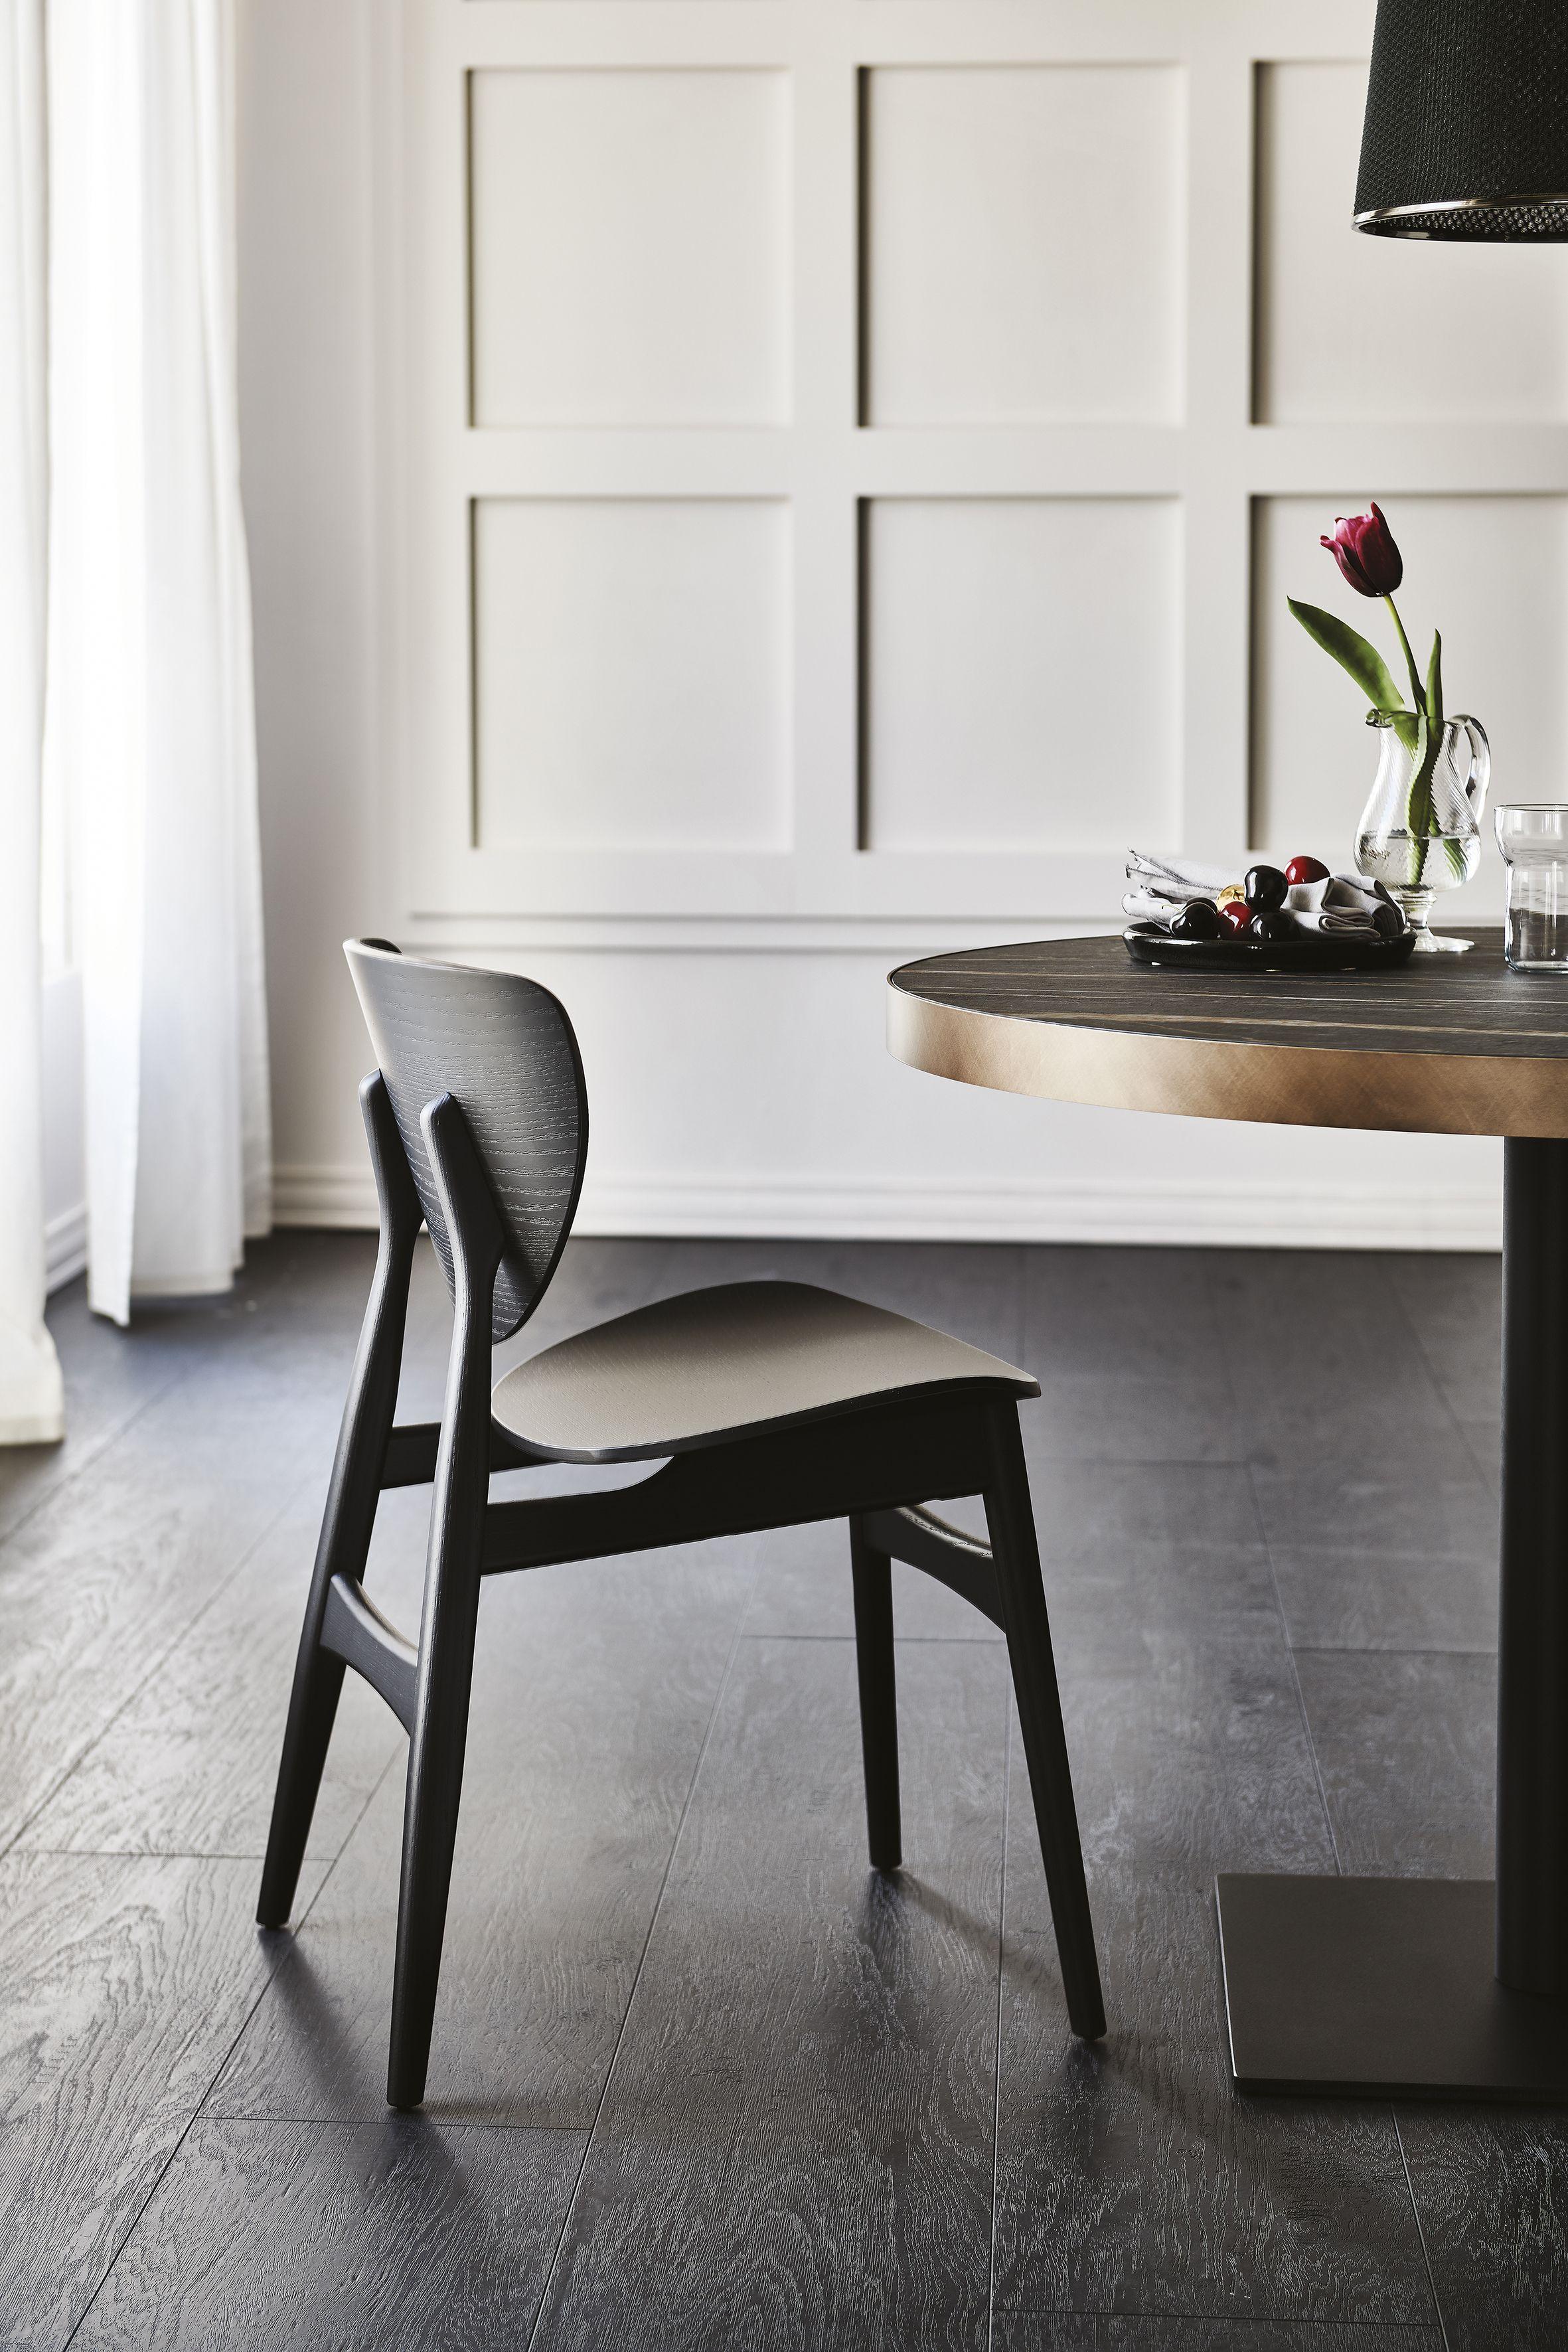 Dumbo Wood Chair Chair Wood Chair Furniture